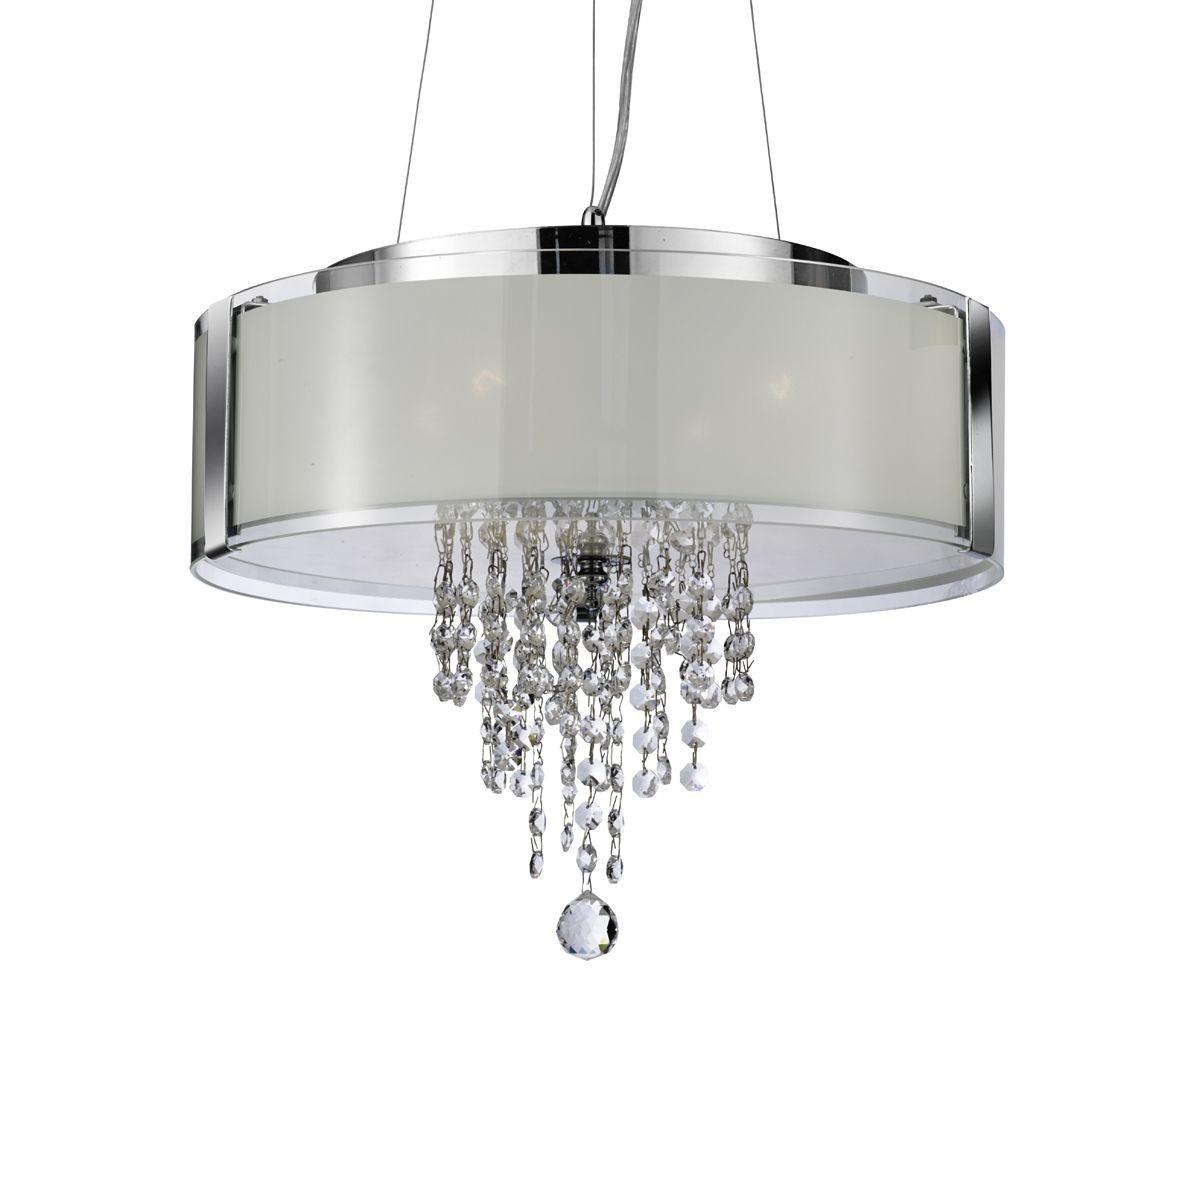 Decorative Crystal Glass Pendant Light - Chrome, with ...